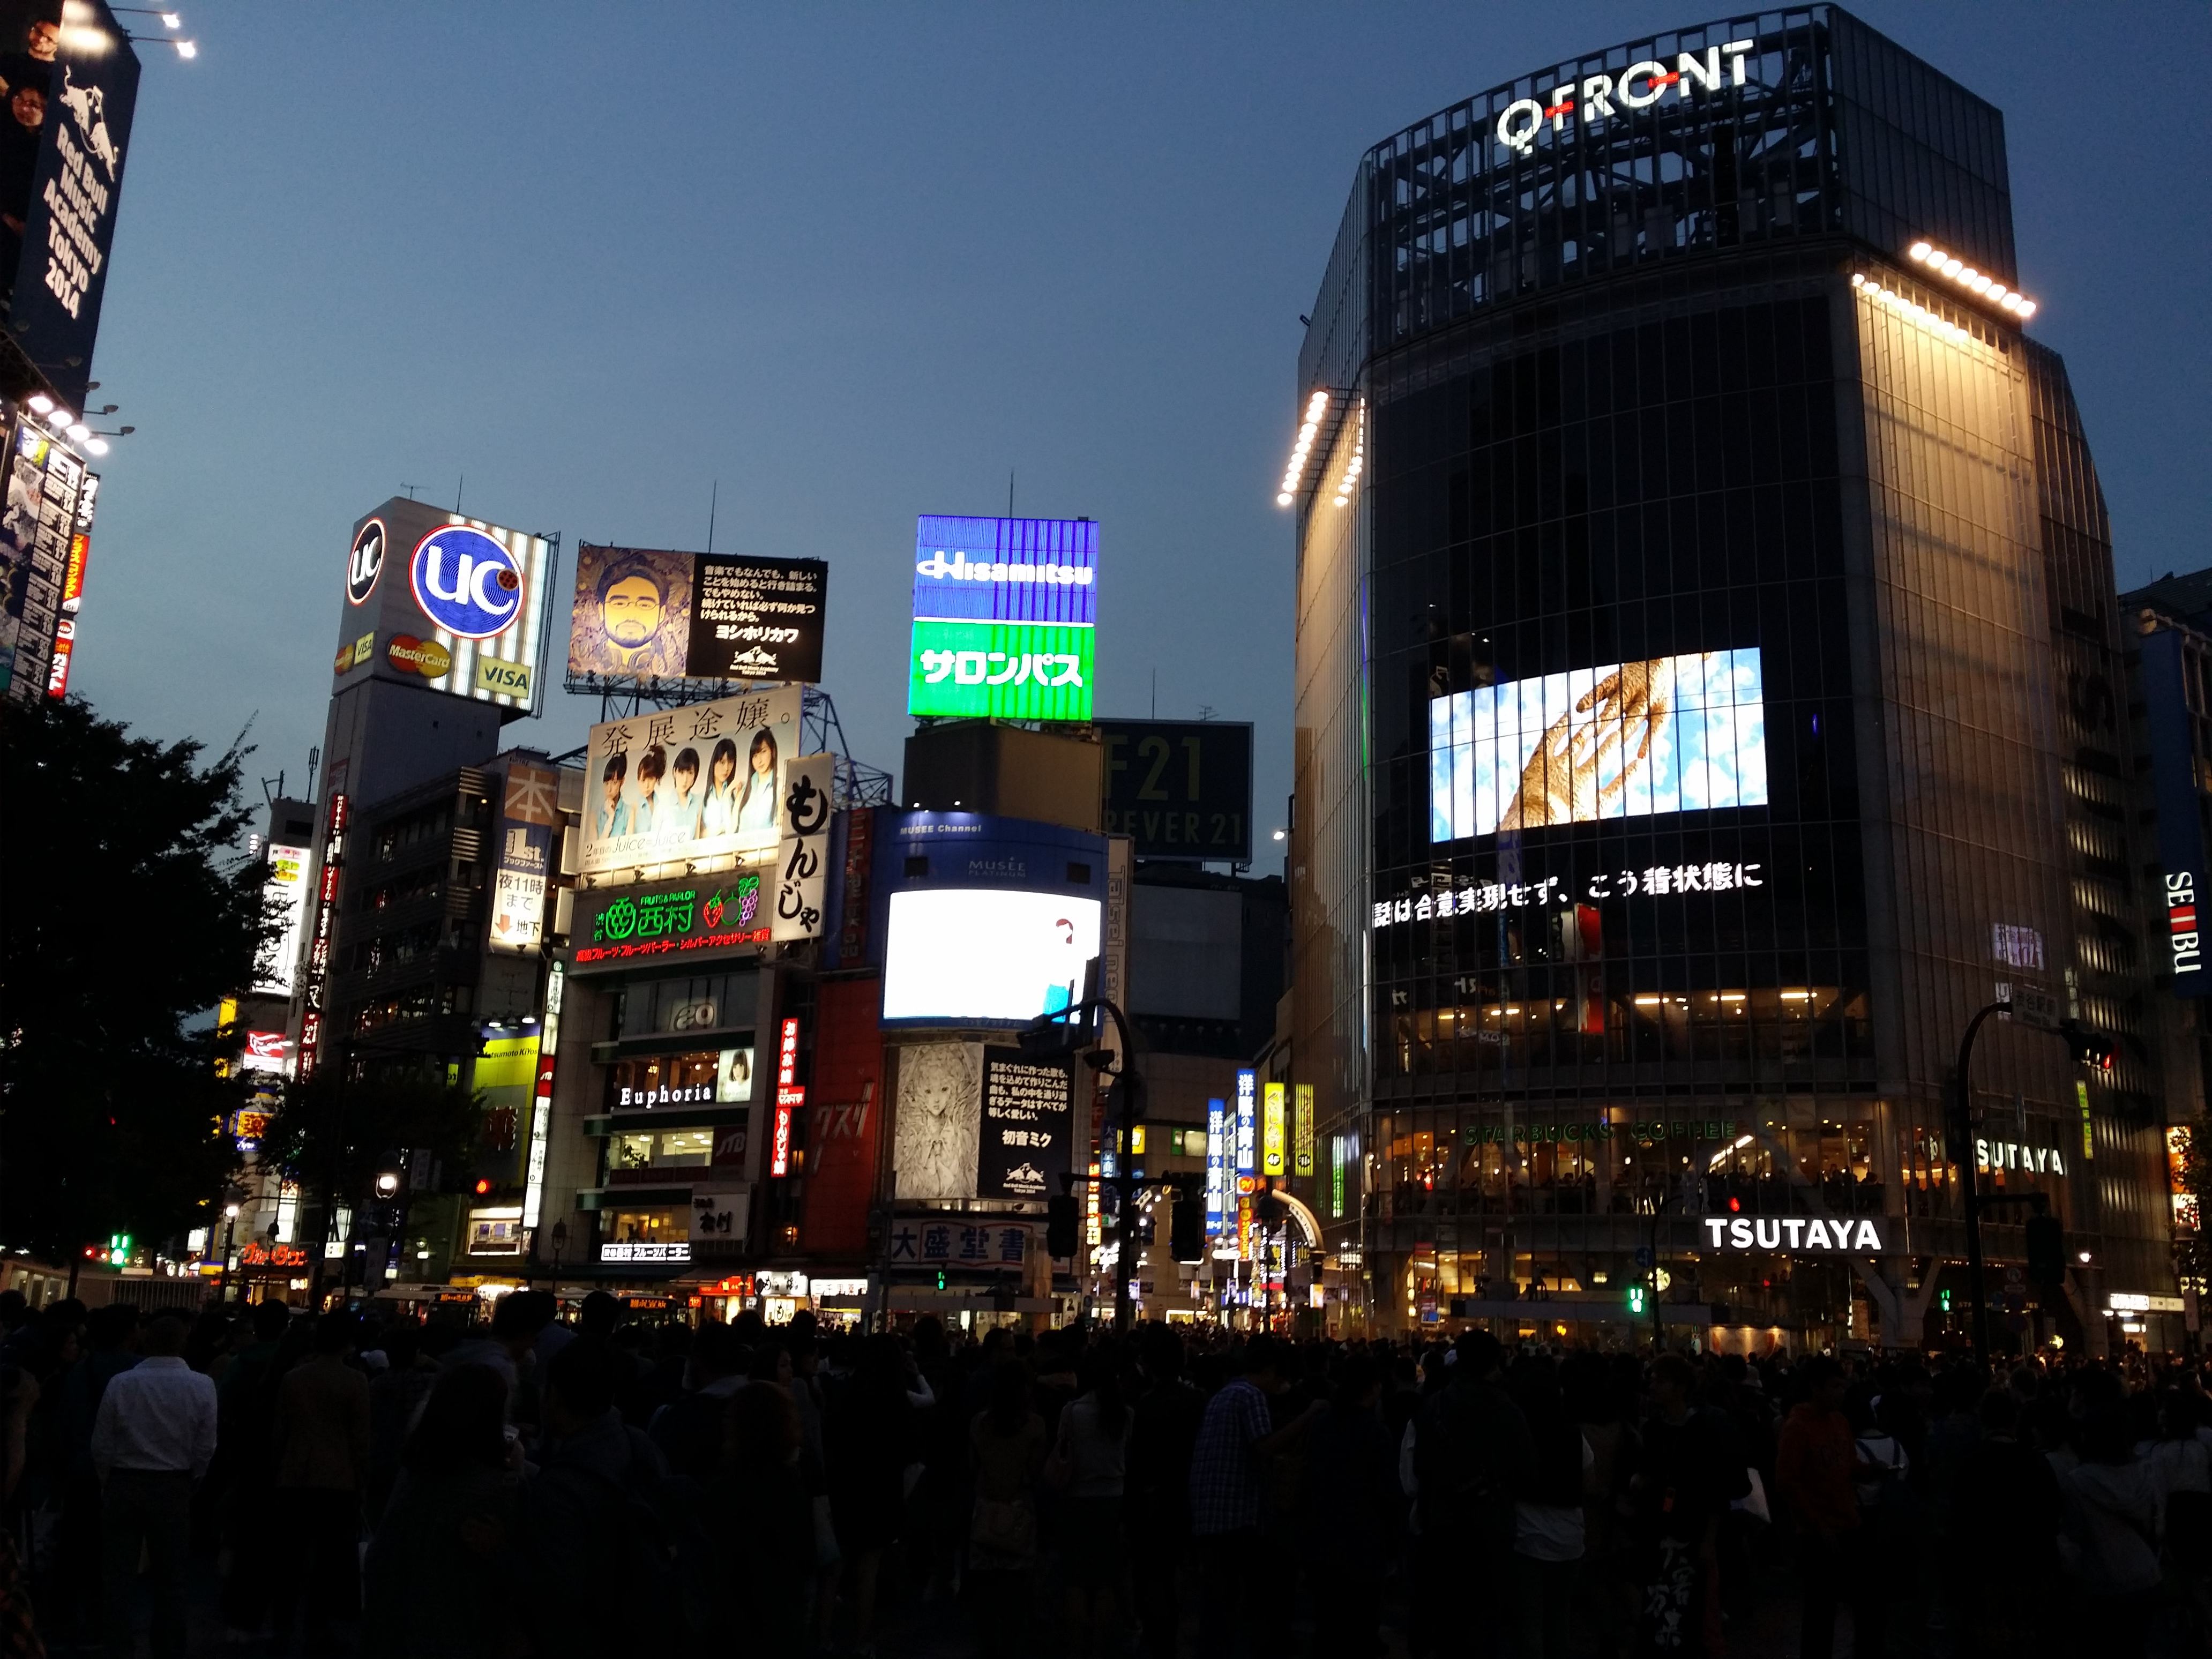 Carnet de voyage : Japon - Tokyo 44432520141012101922